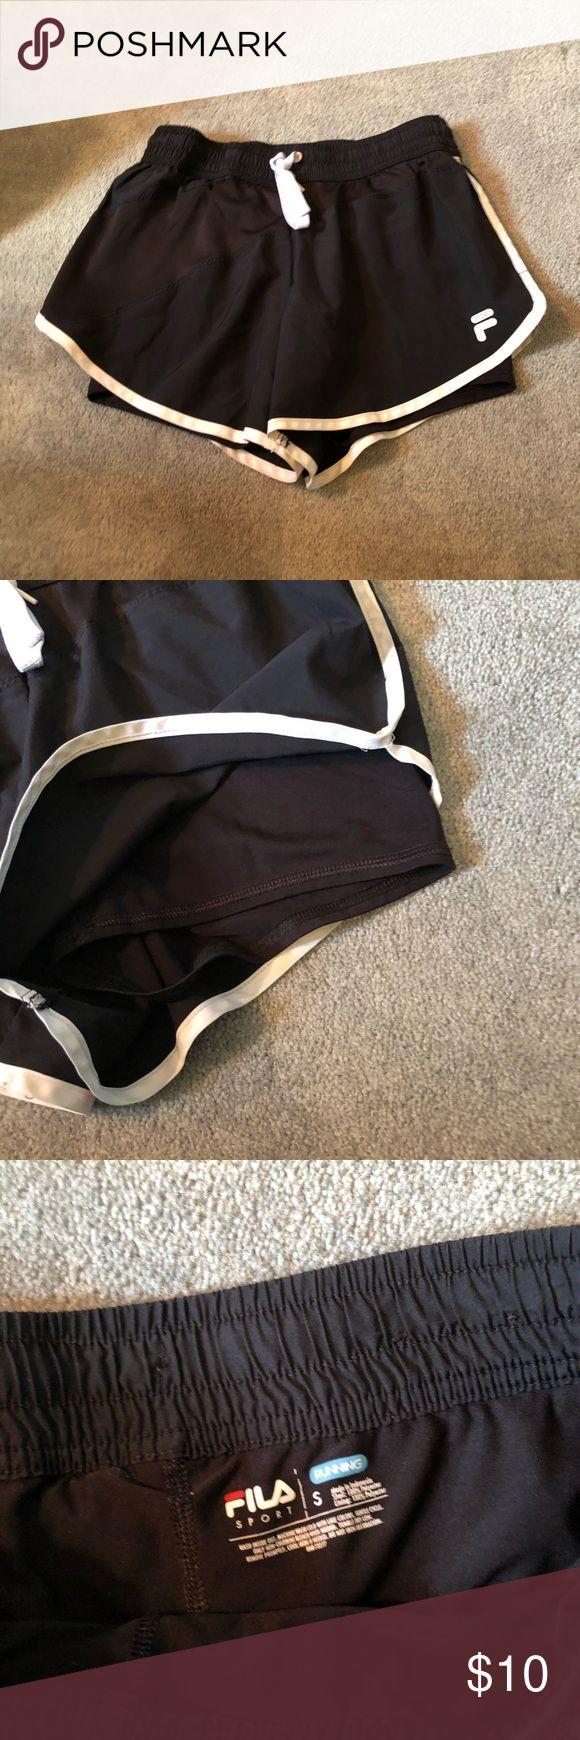 Fila Athletic Shorts Gym shorts with inside spandex  shorts Fila Shorts